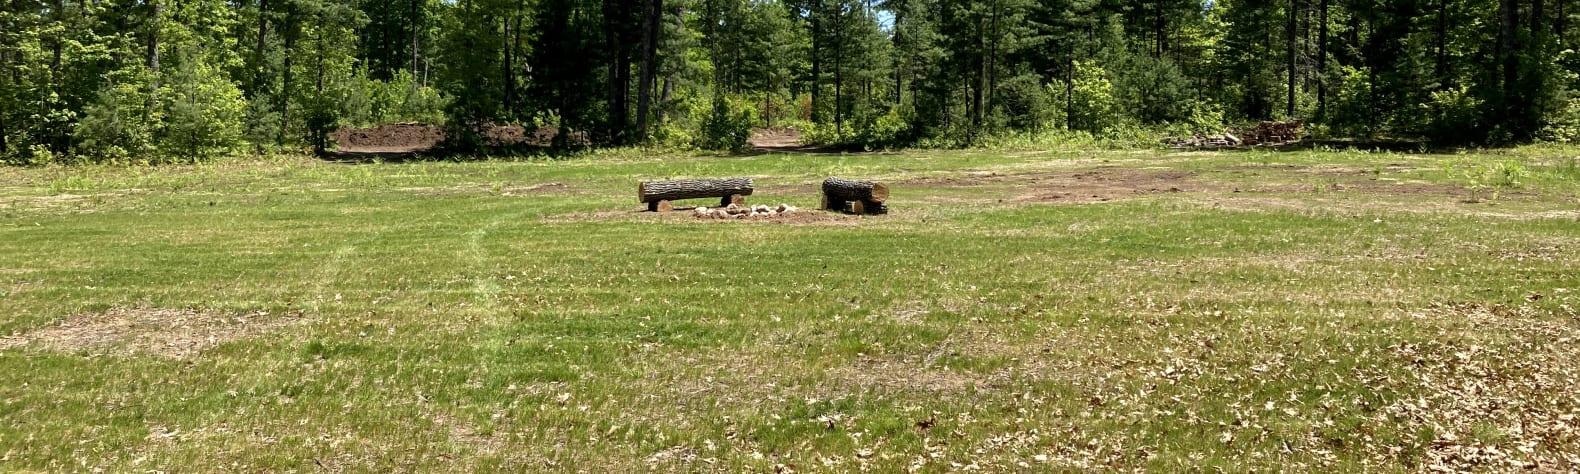 Whiskey Woods Campsites